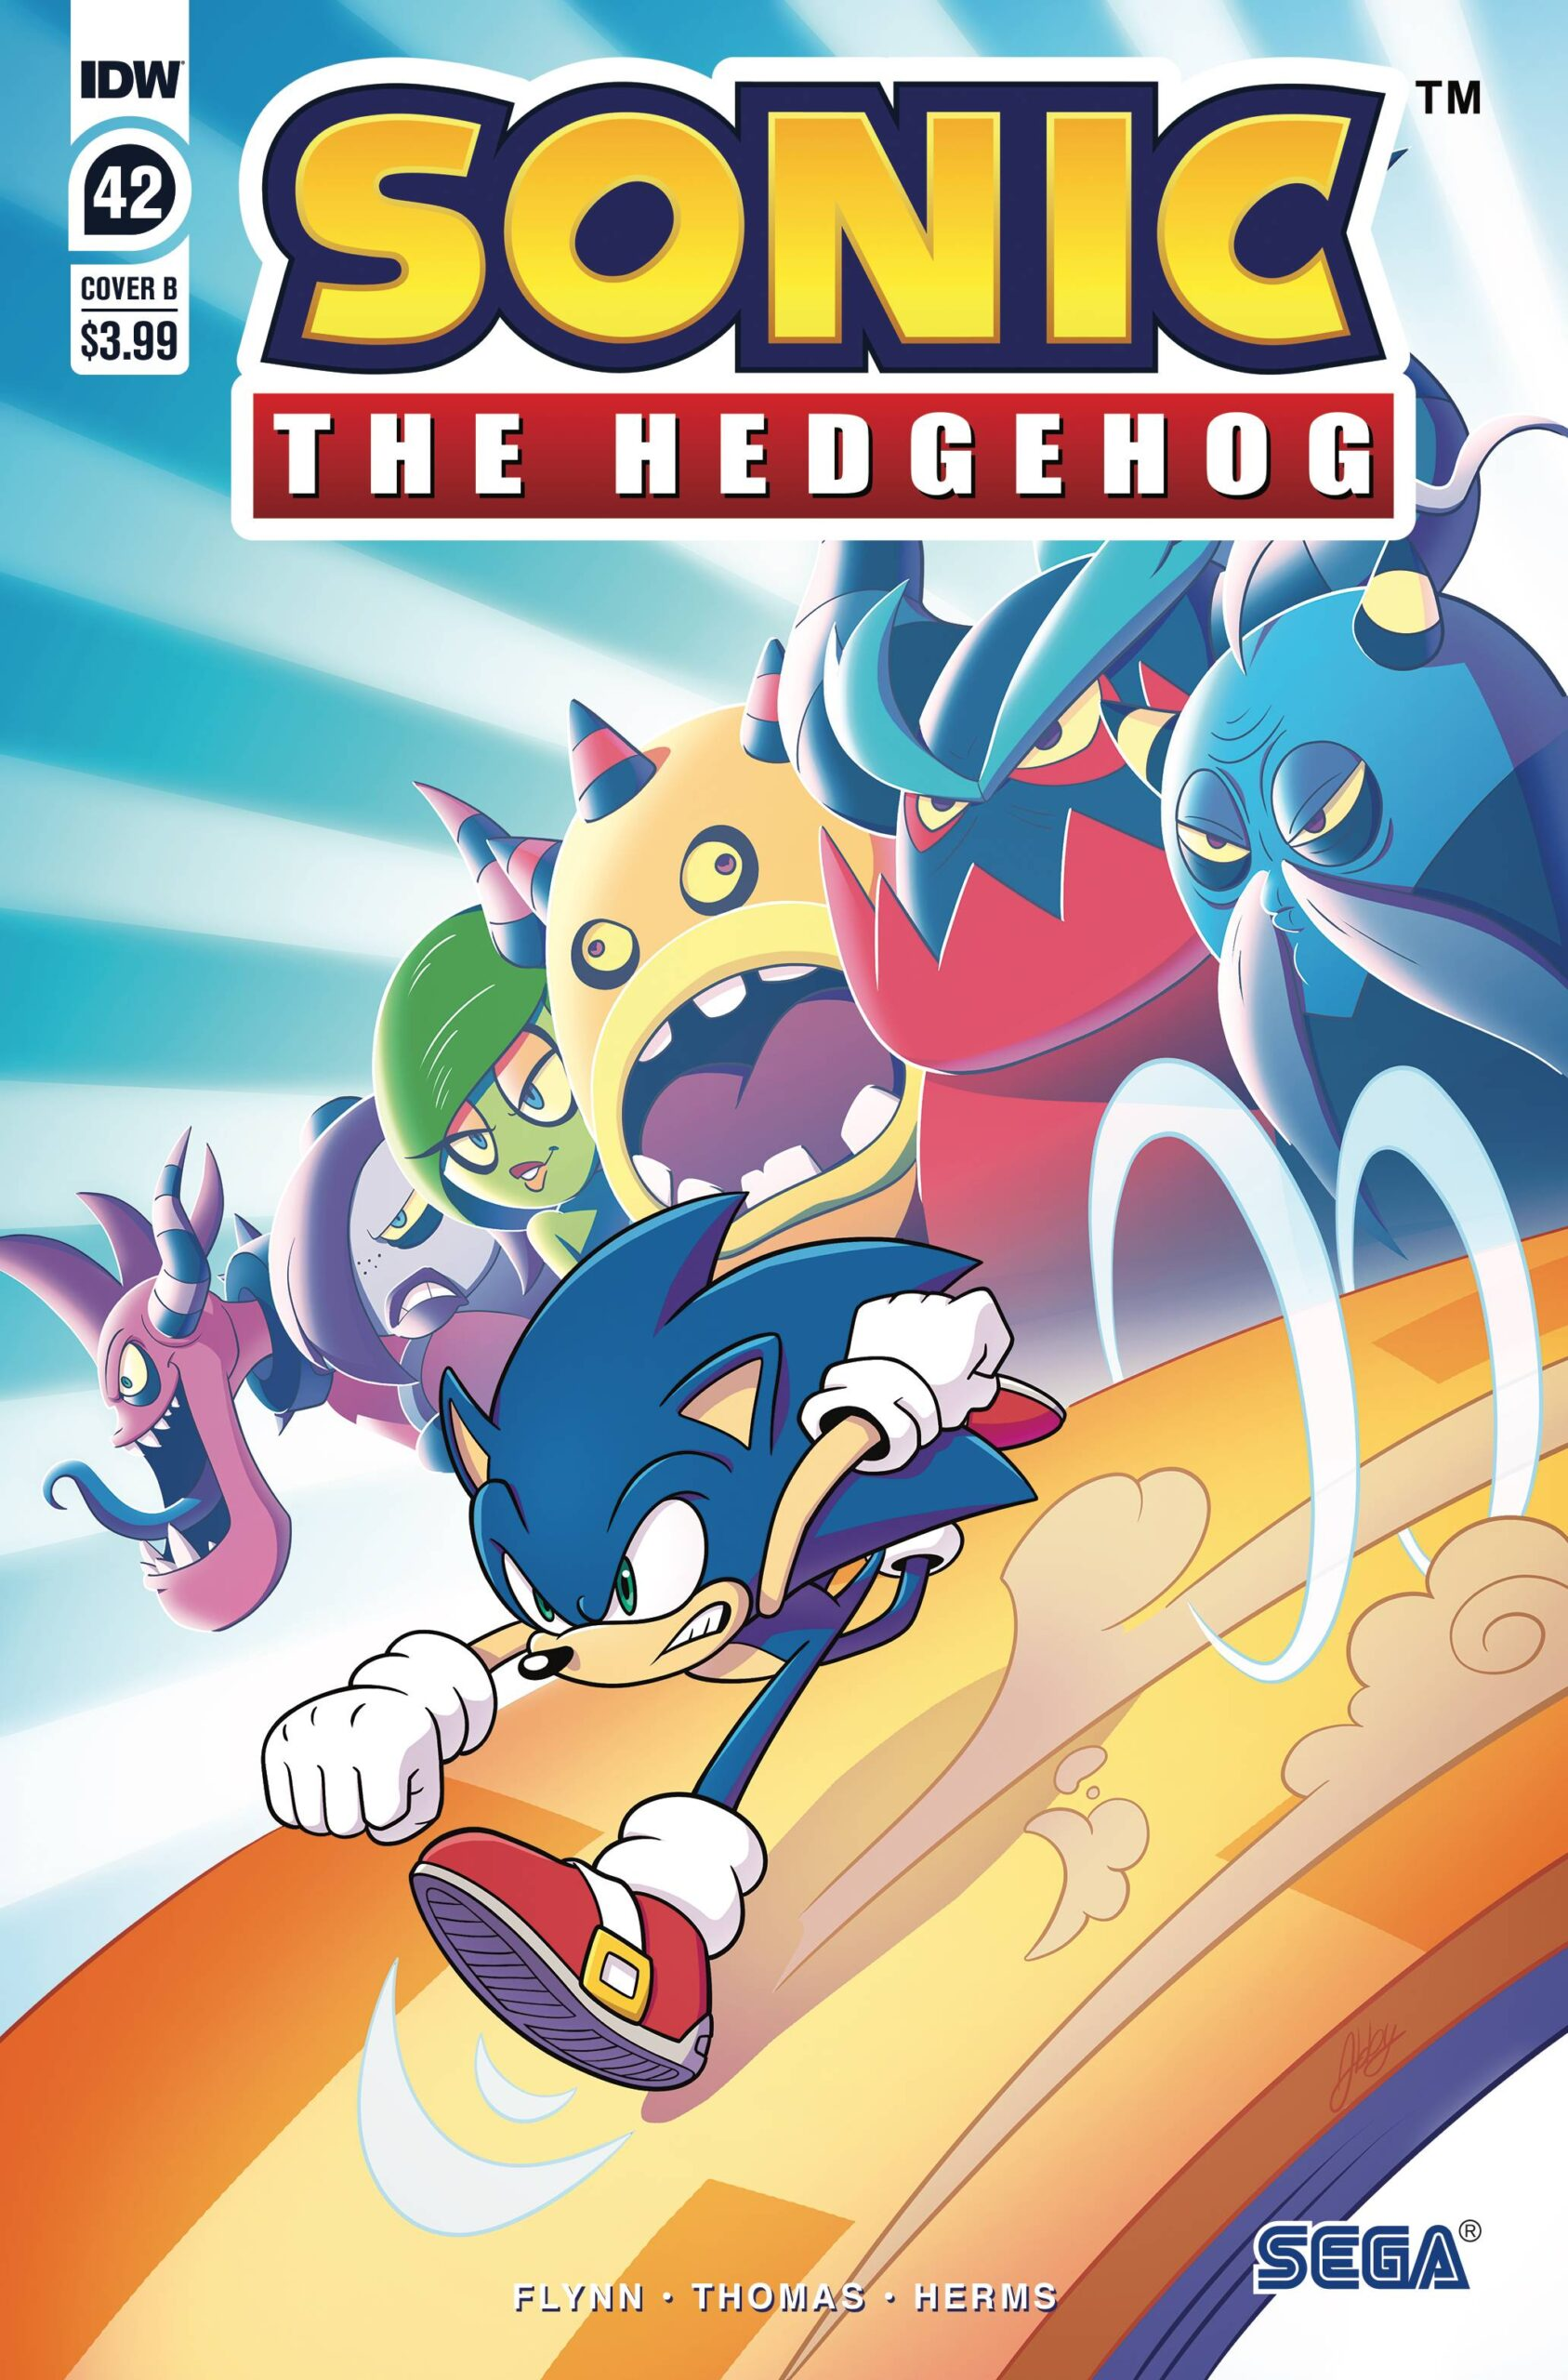 Sonic The Hedgehog #42 Cover B